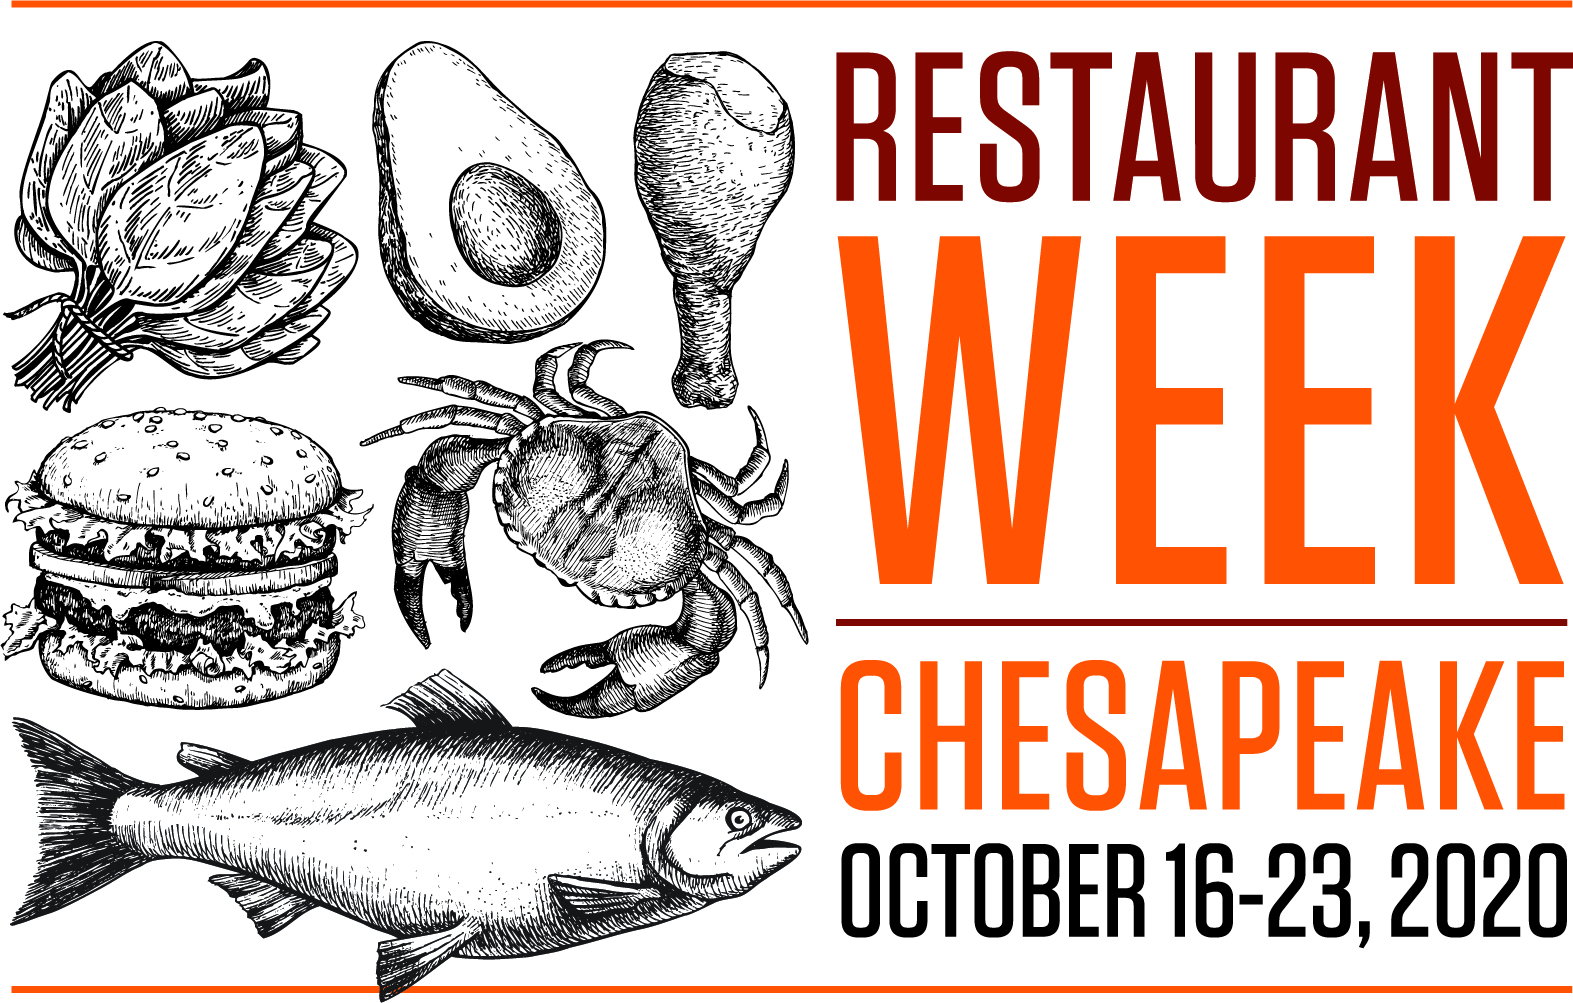 Chesapeake Restaurant Week 2020